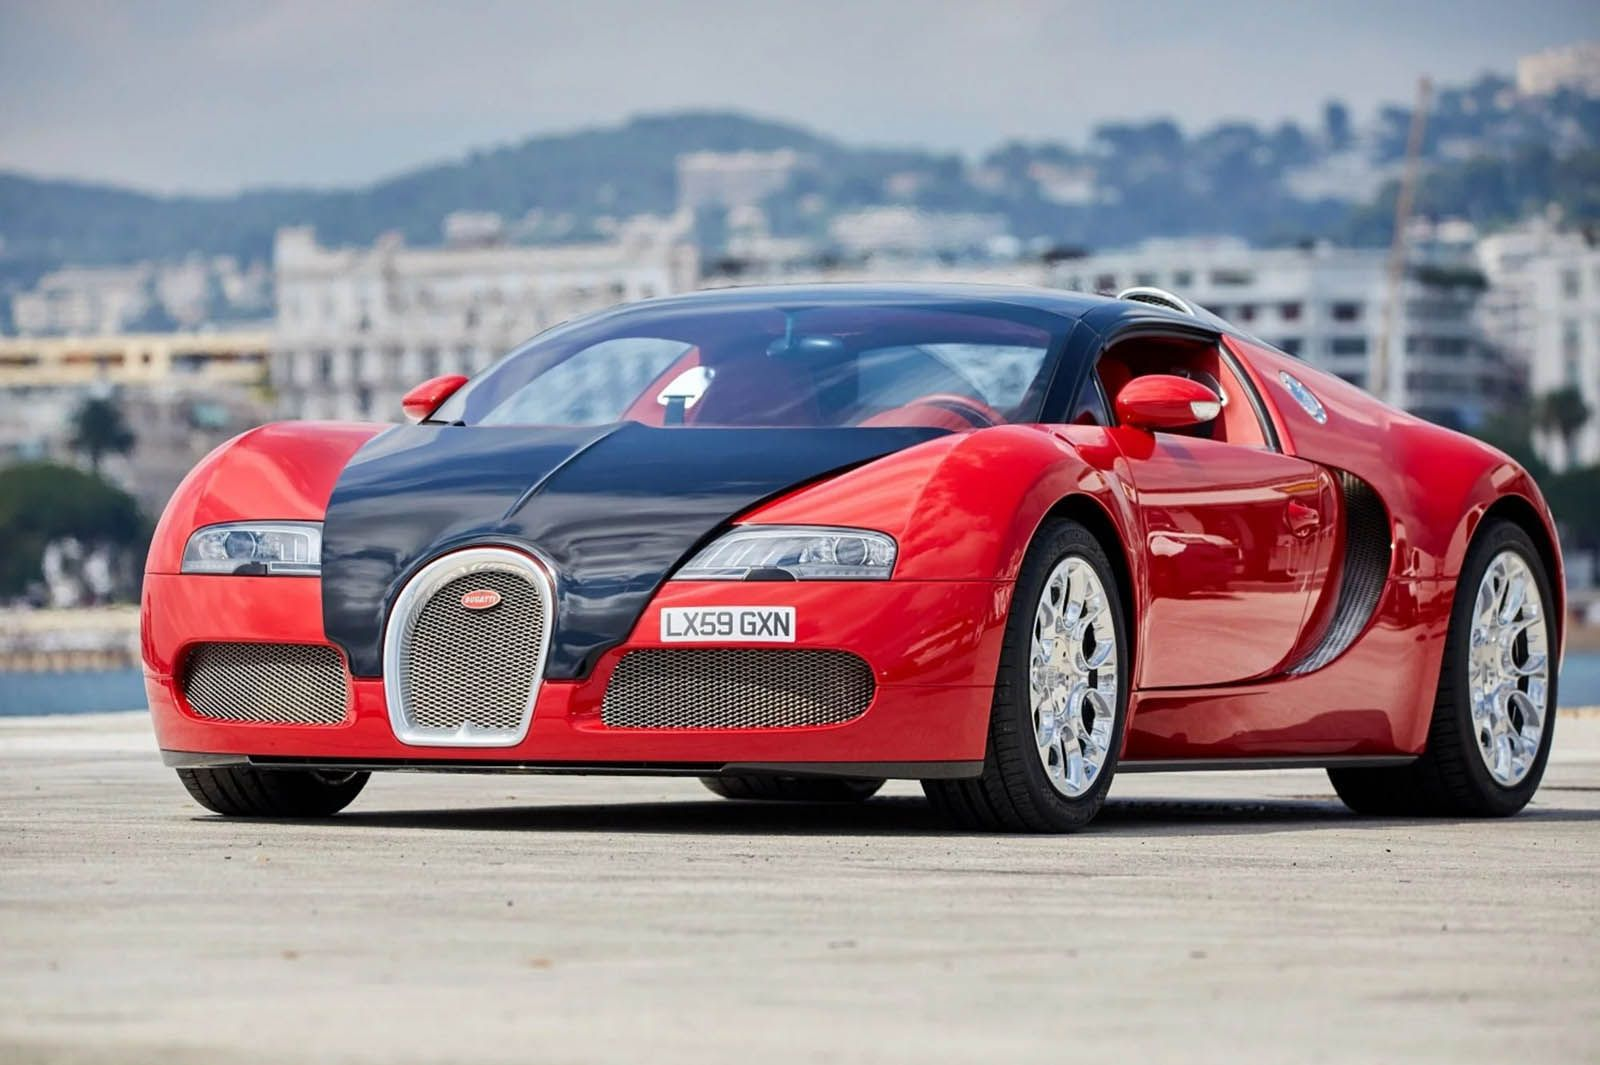 Deep Down This Red Bugatti Veyron Grand Sport Is Actually Blue Carscoops Bugatti Veyron Bugatti Sports Cars Luxury